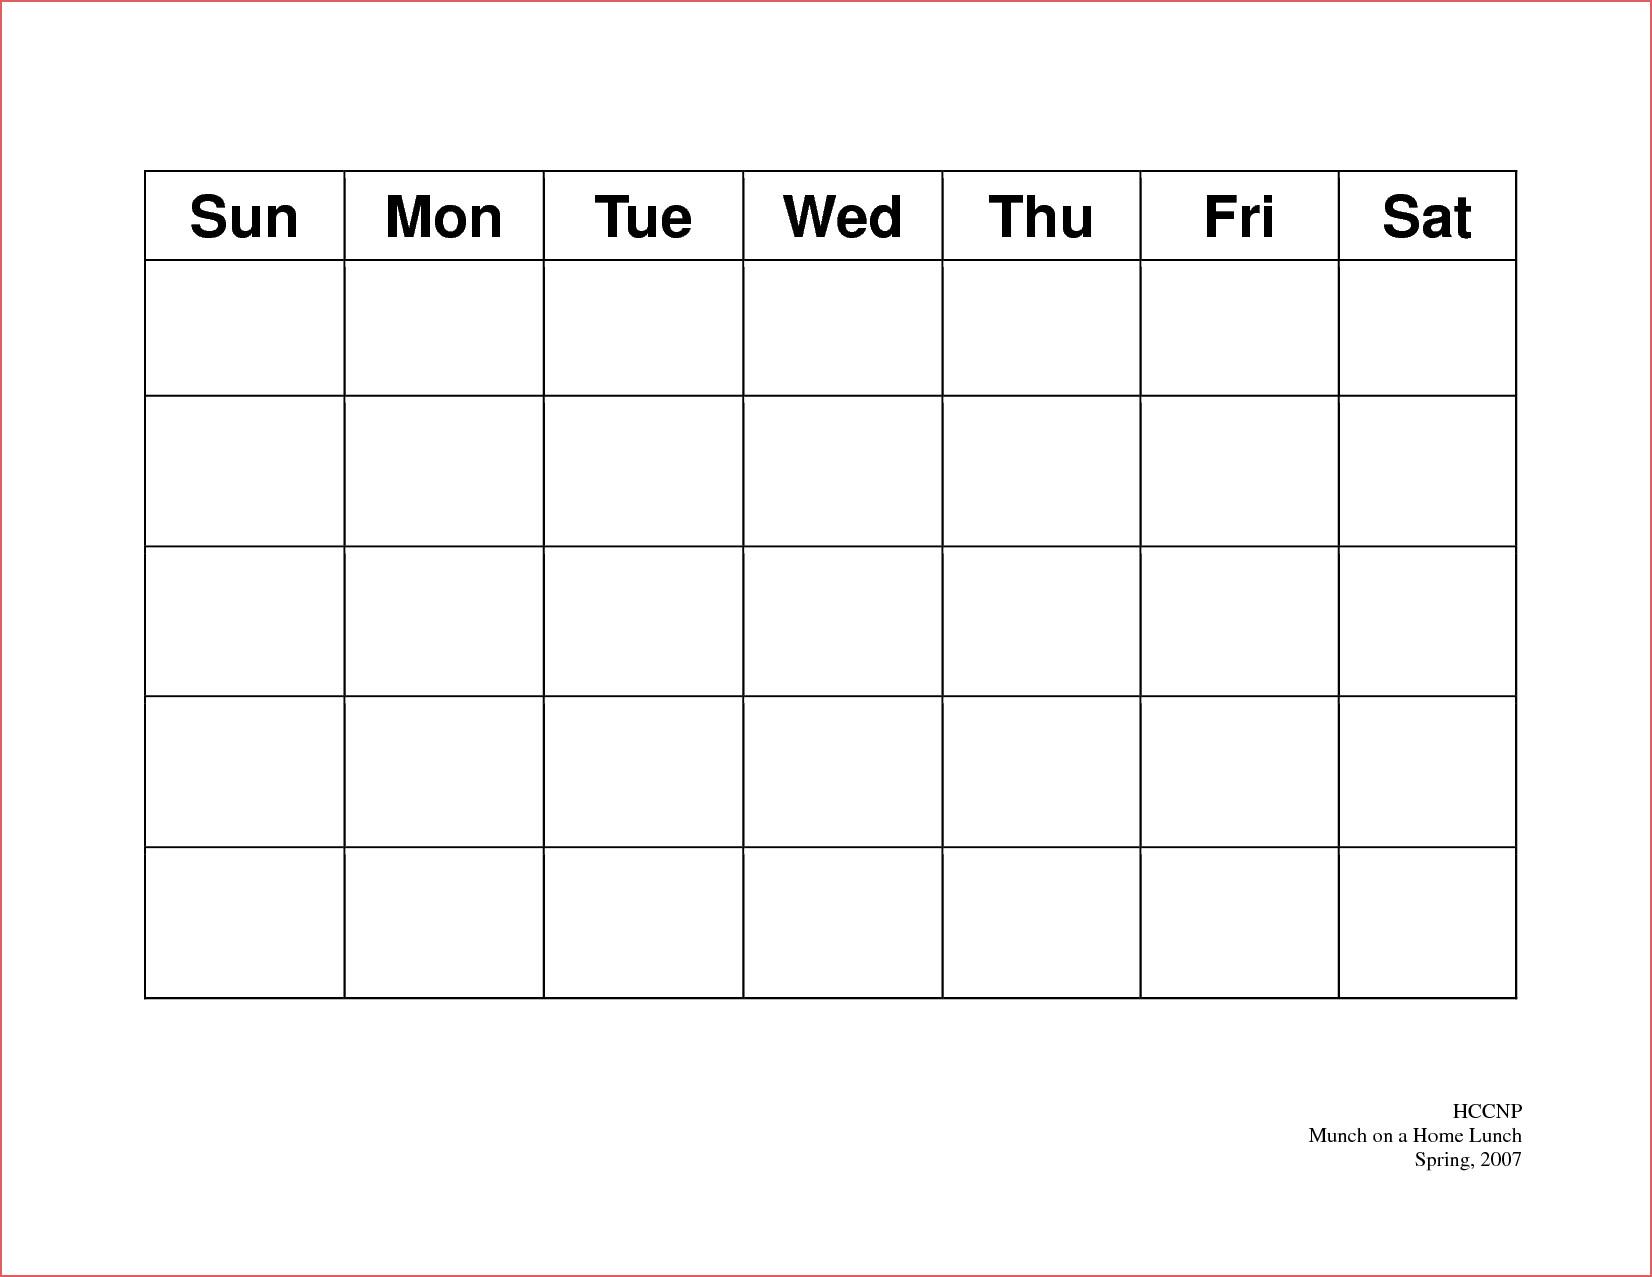 Weekly Calendar Blank Weekly Calendar Template 5 Day Printable inside 5 Day Blank Calendar